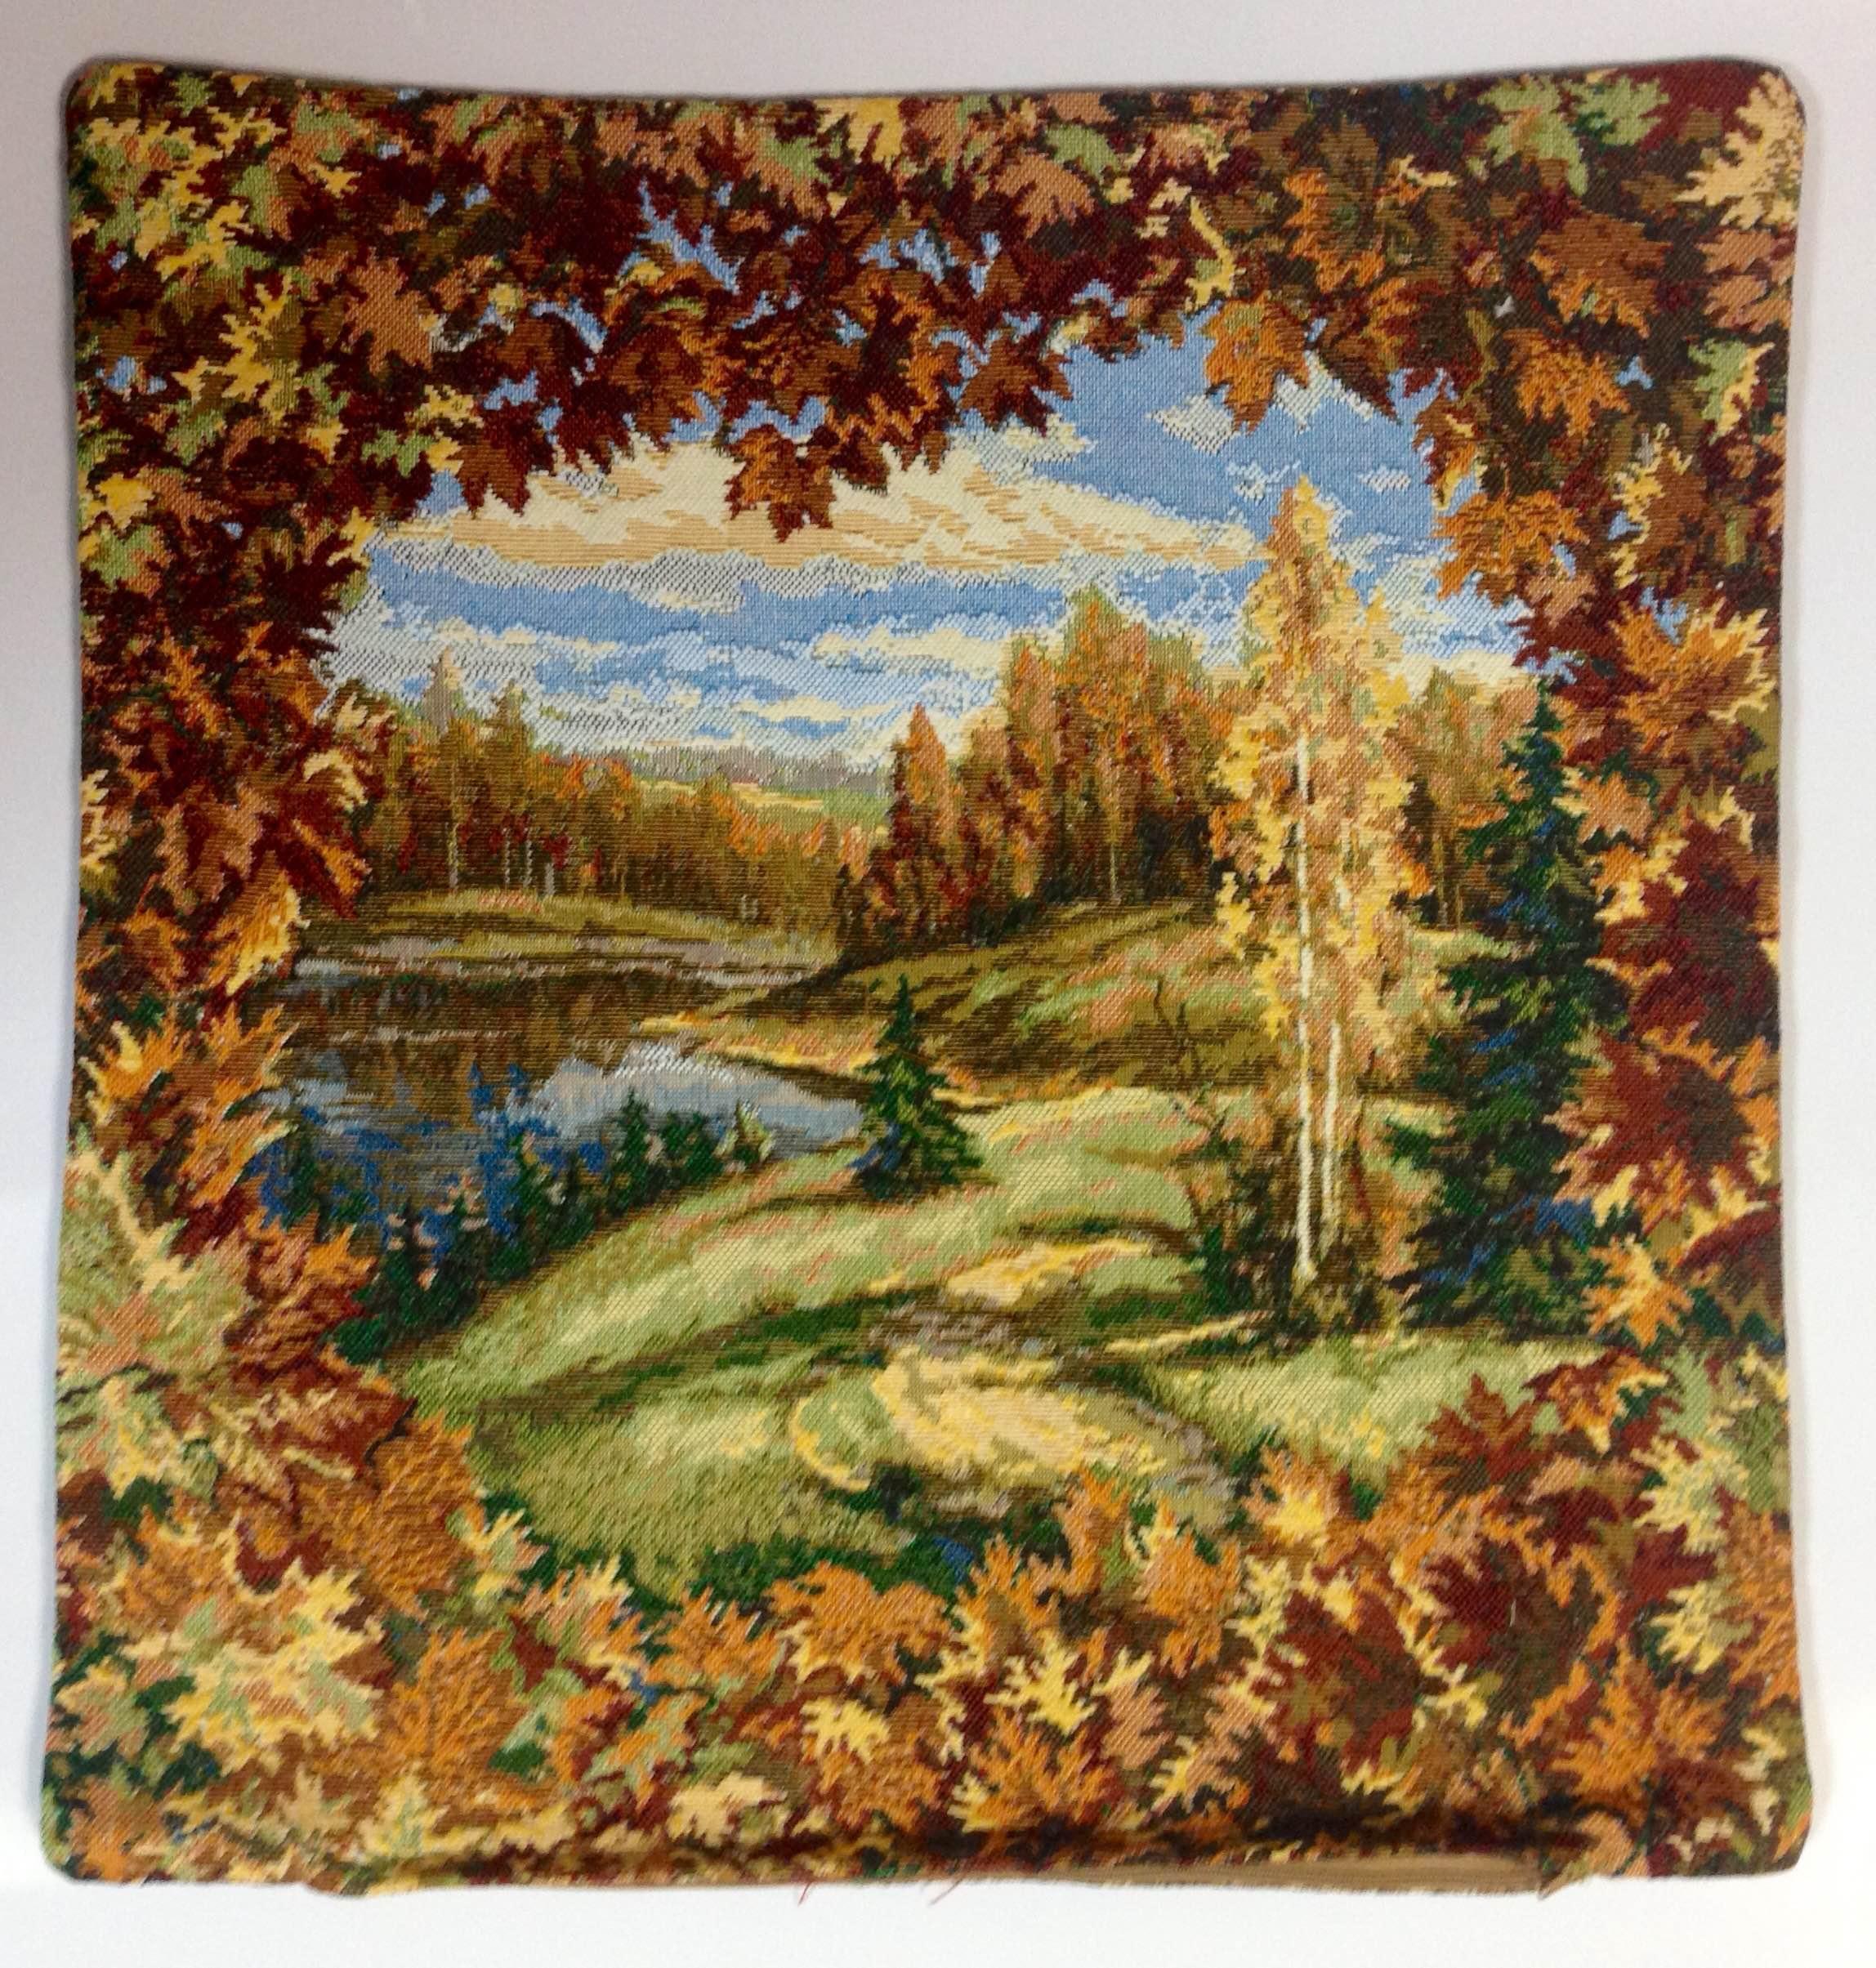 Наволочка гобеленовая Осень на молнииНаволочки<br><br><br>Размер: 50x50